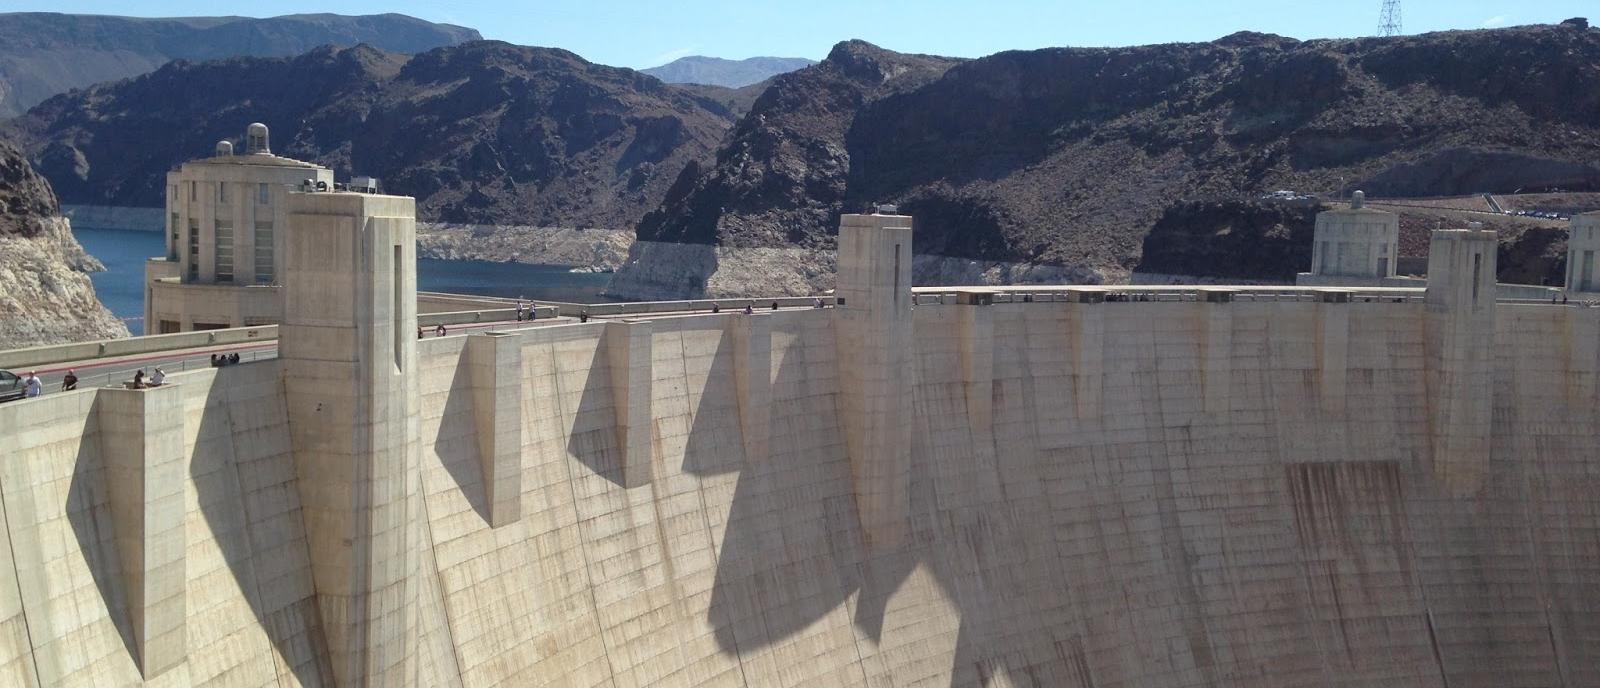 Hoover Dam Tours from Las Vegas.JPG